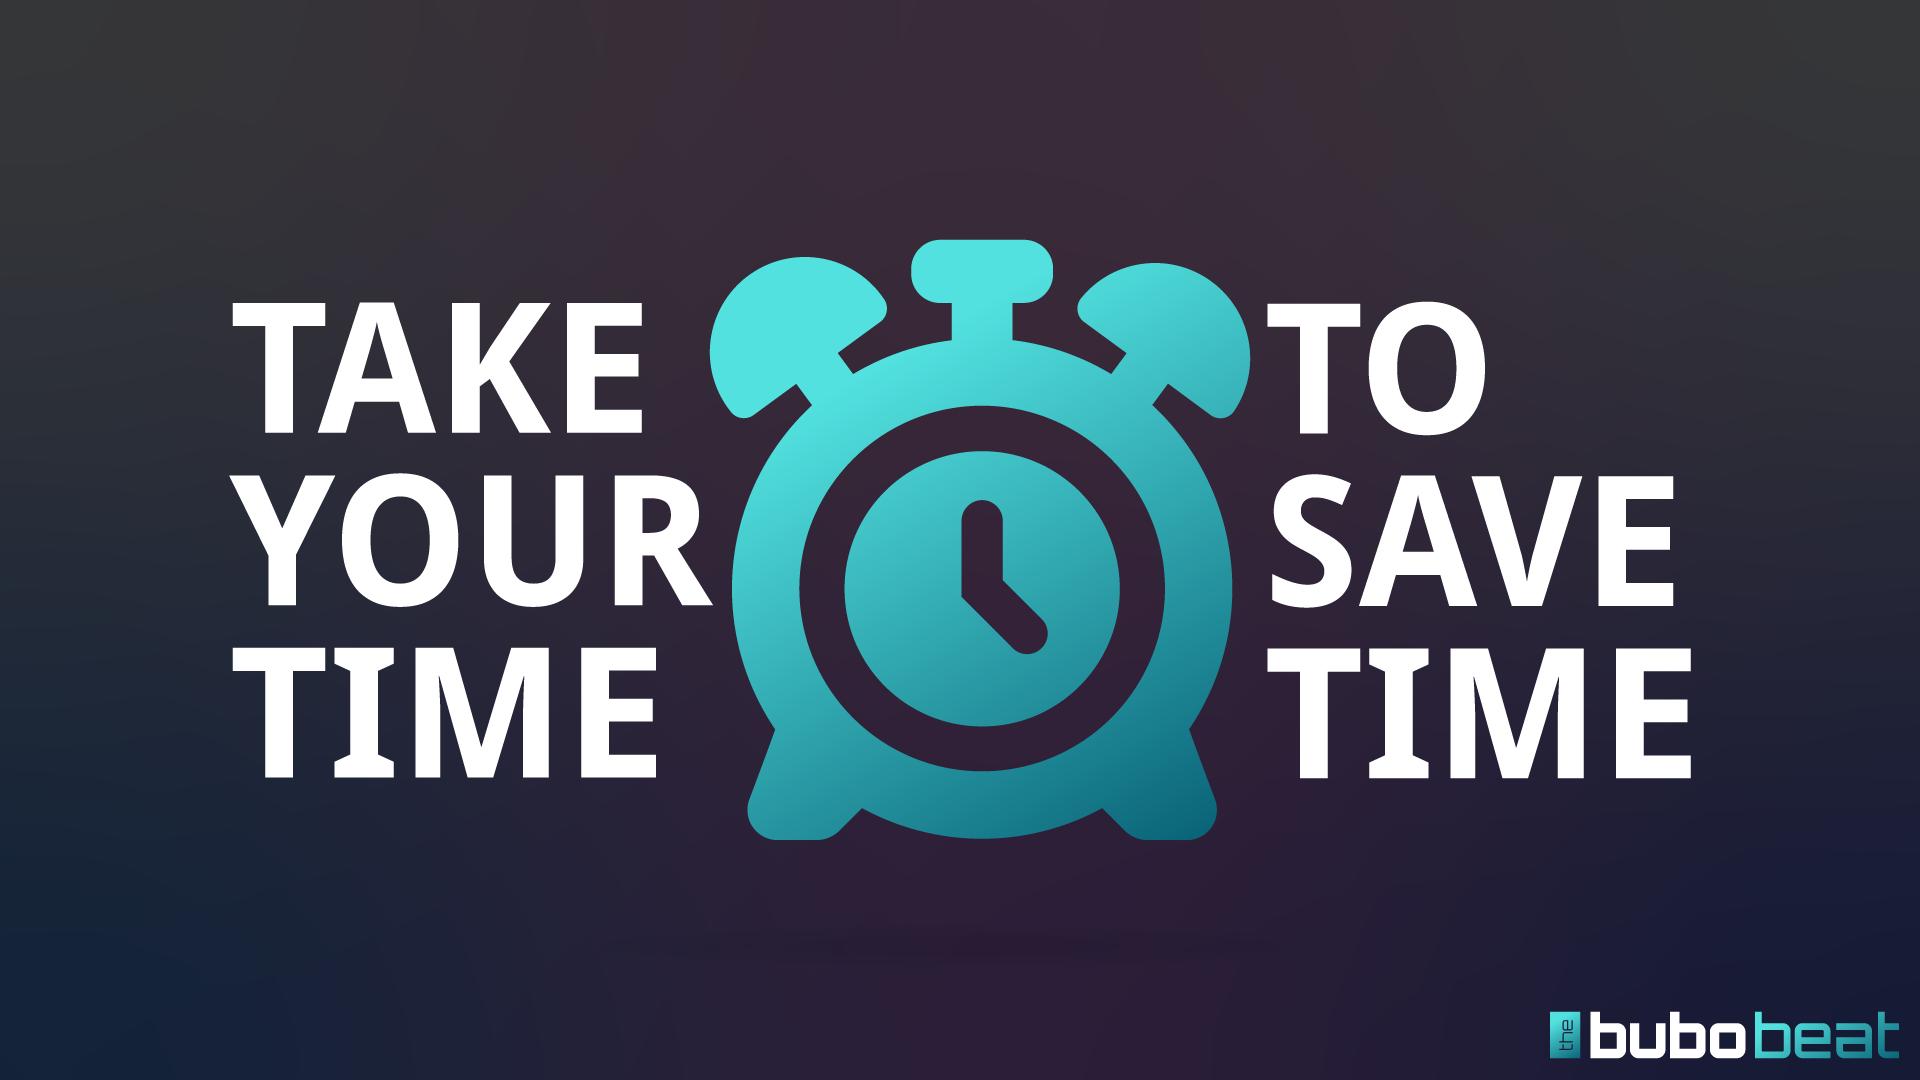 Take time to save time